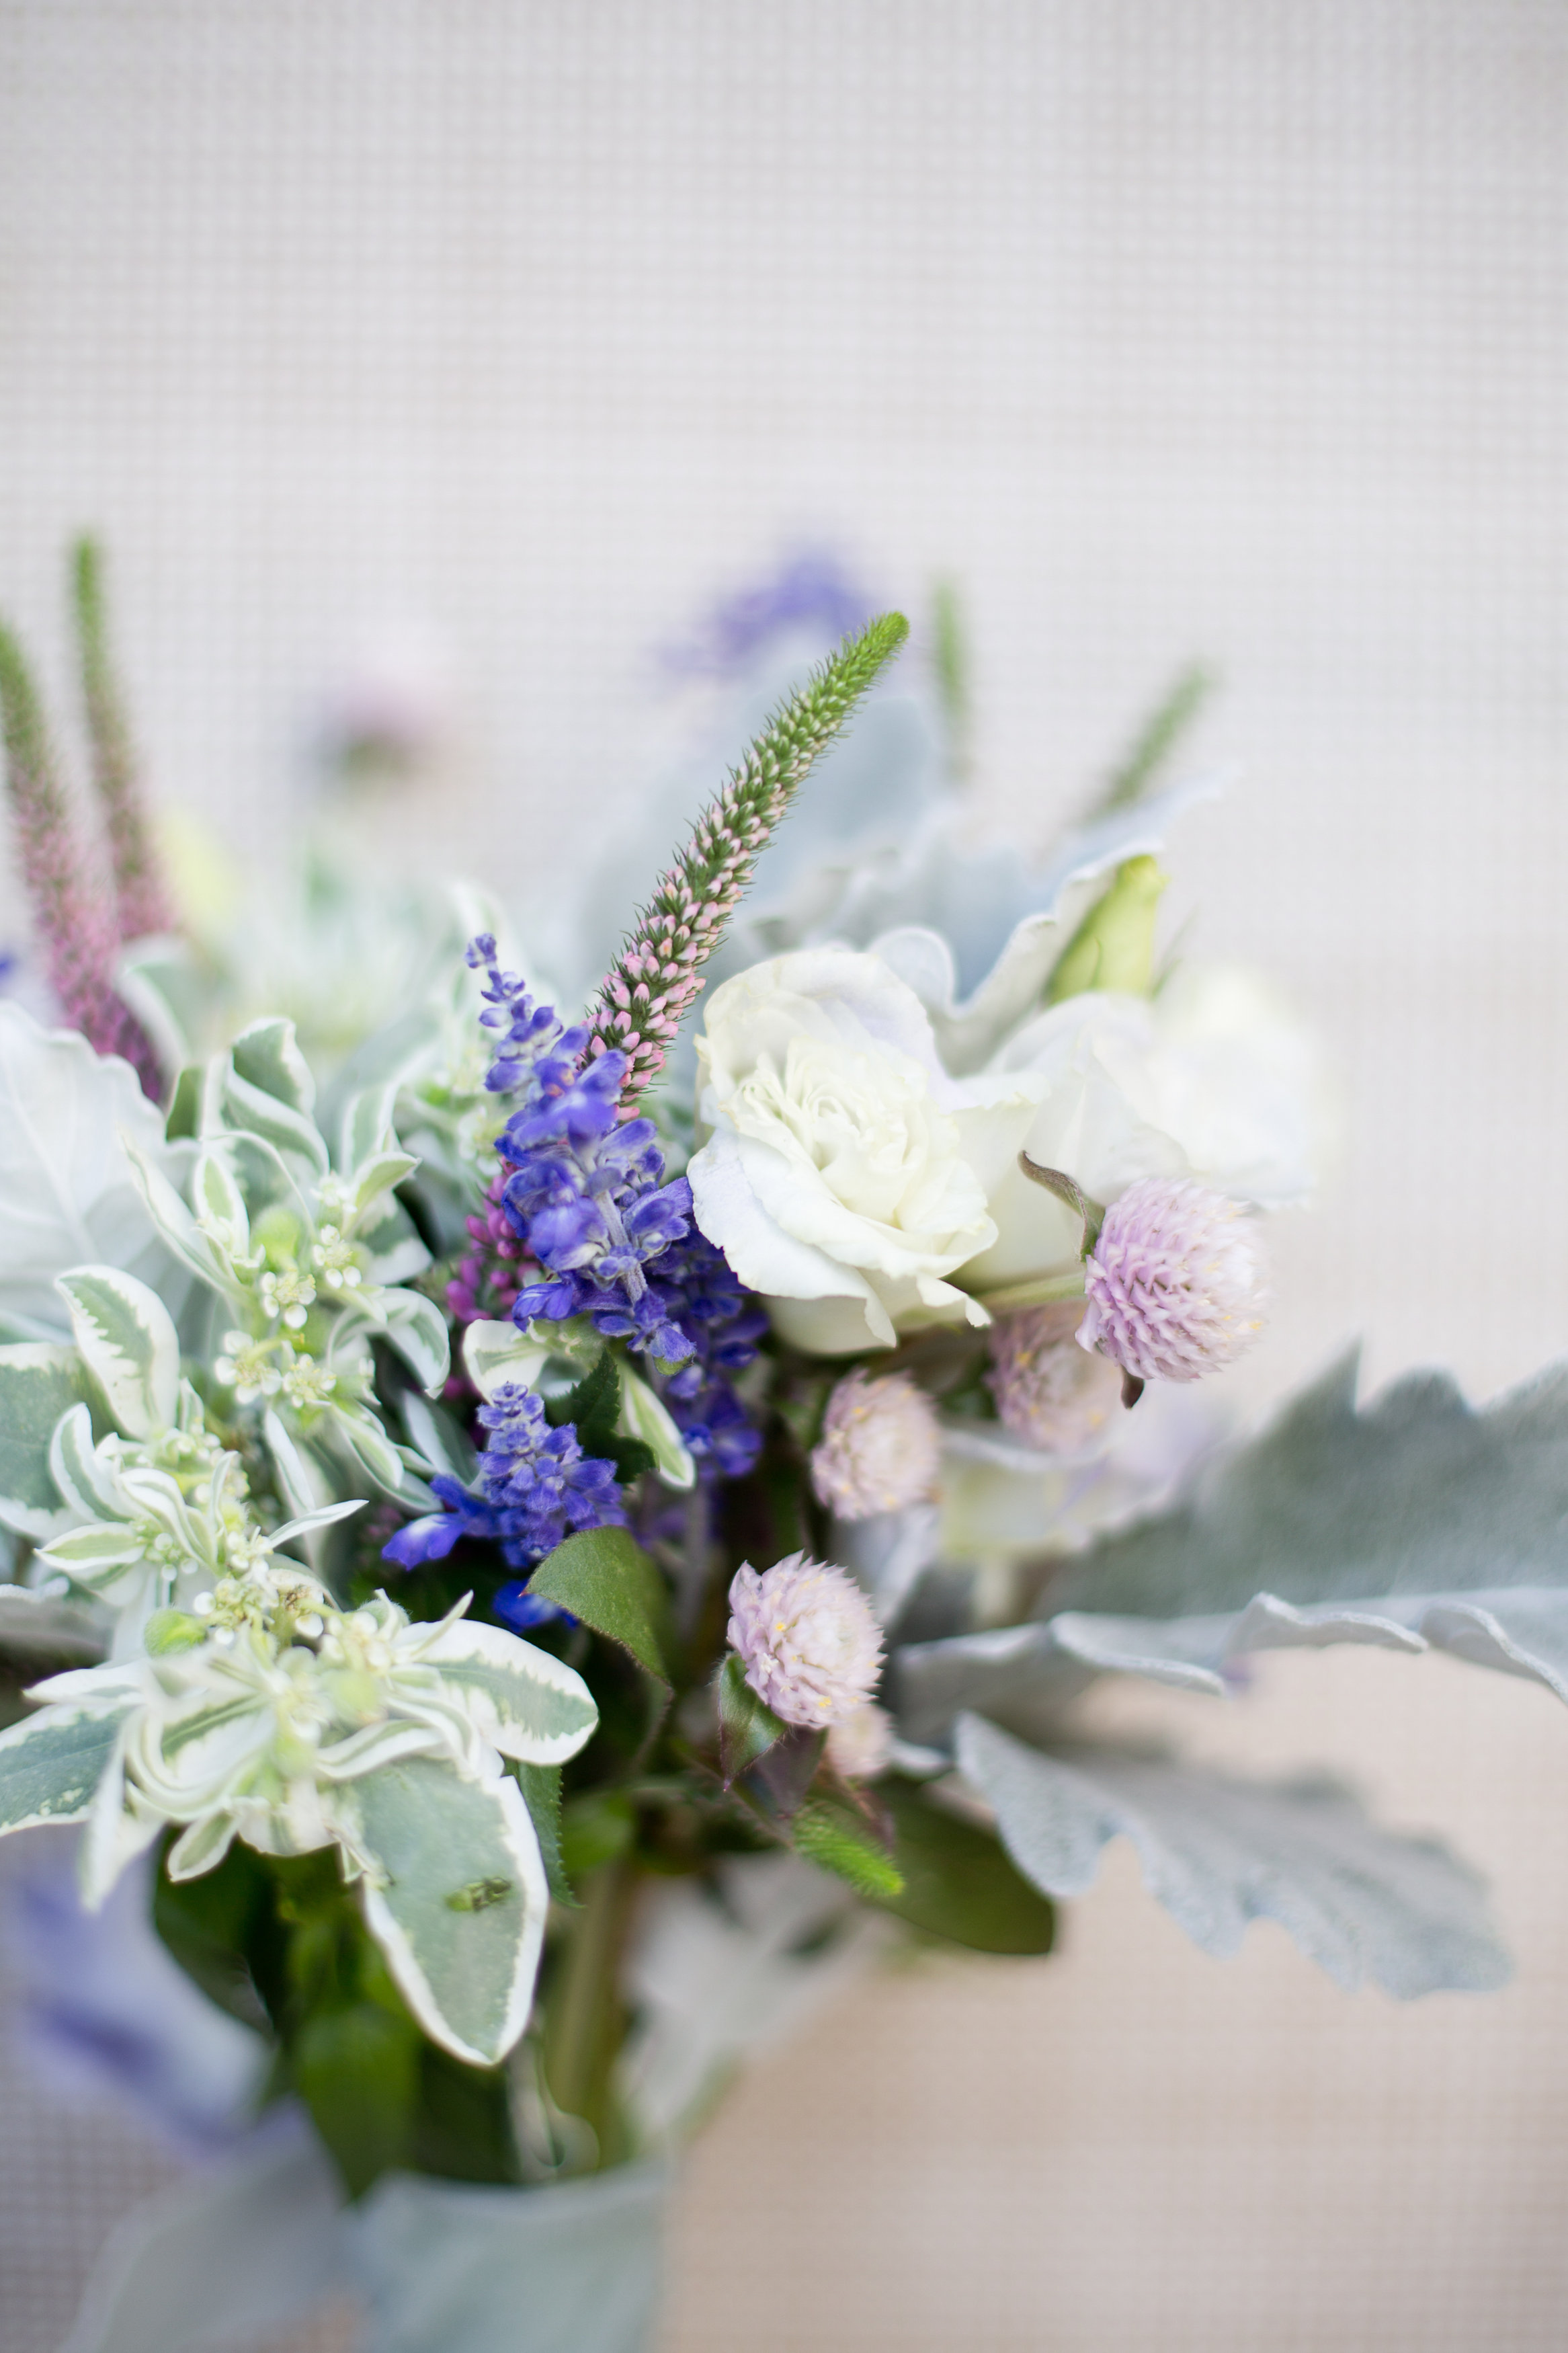 Dusty miller bridesmaids bouquet